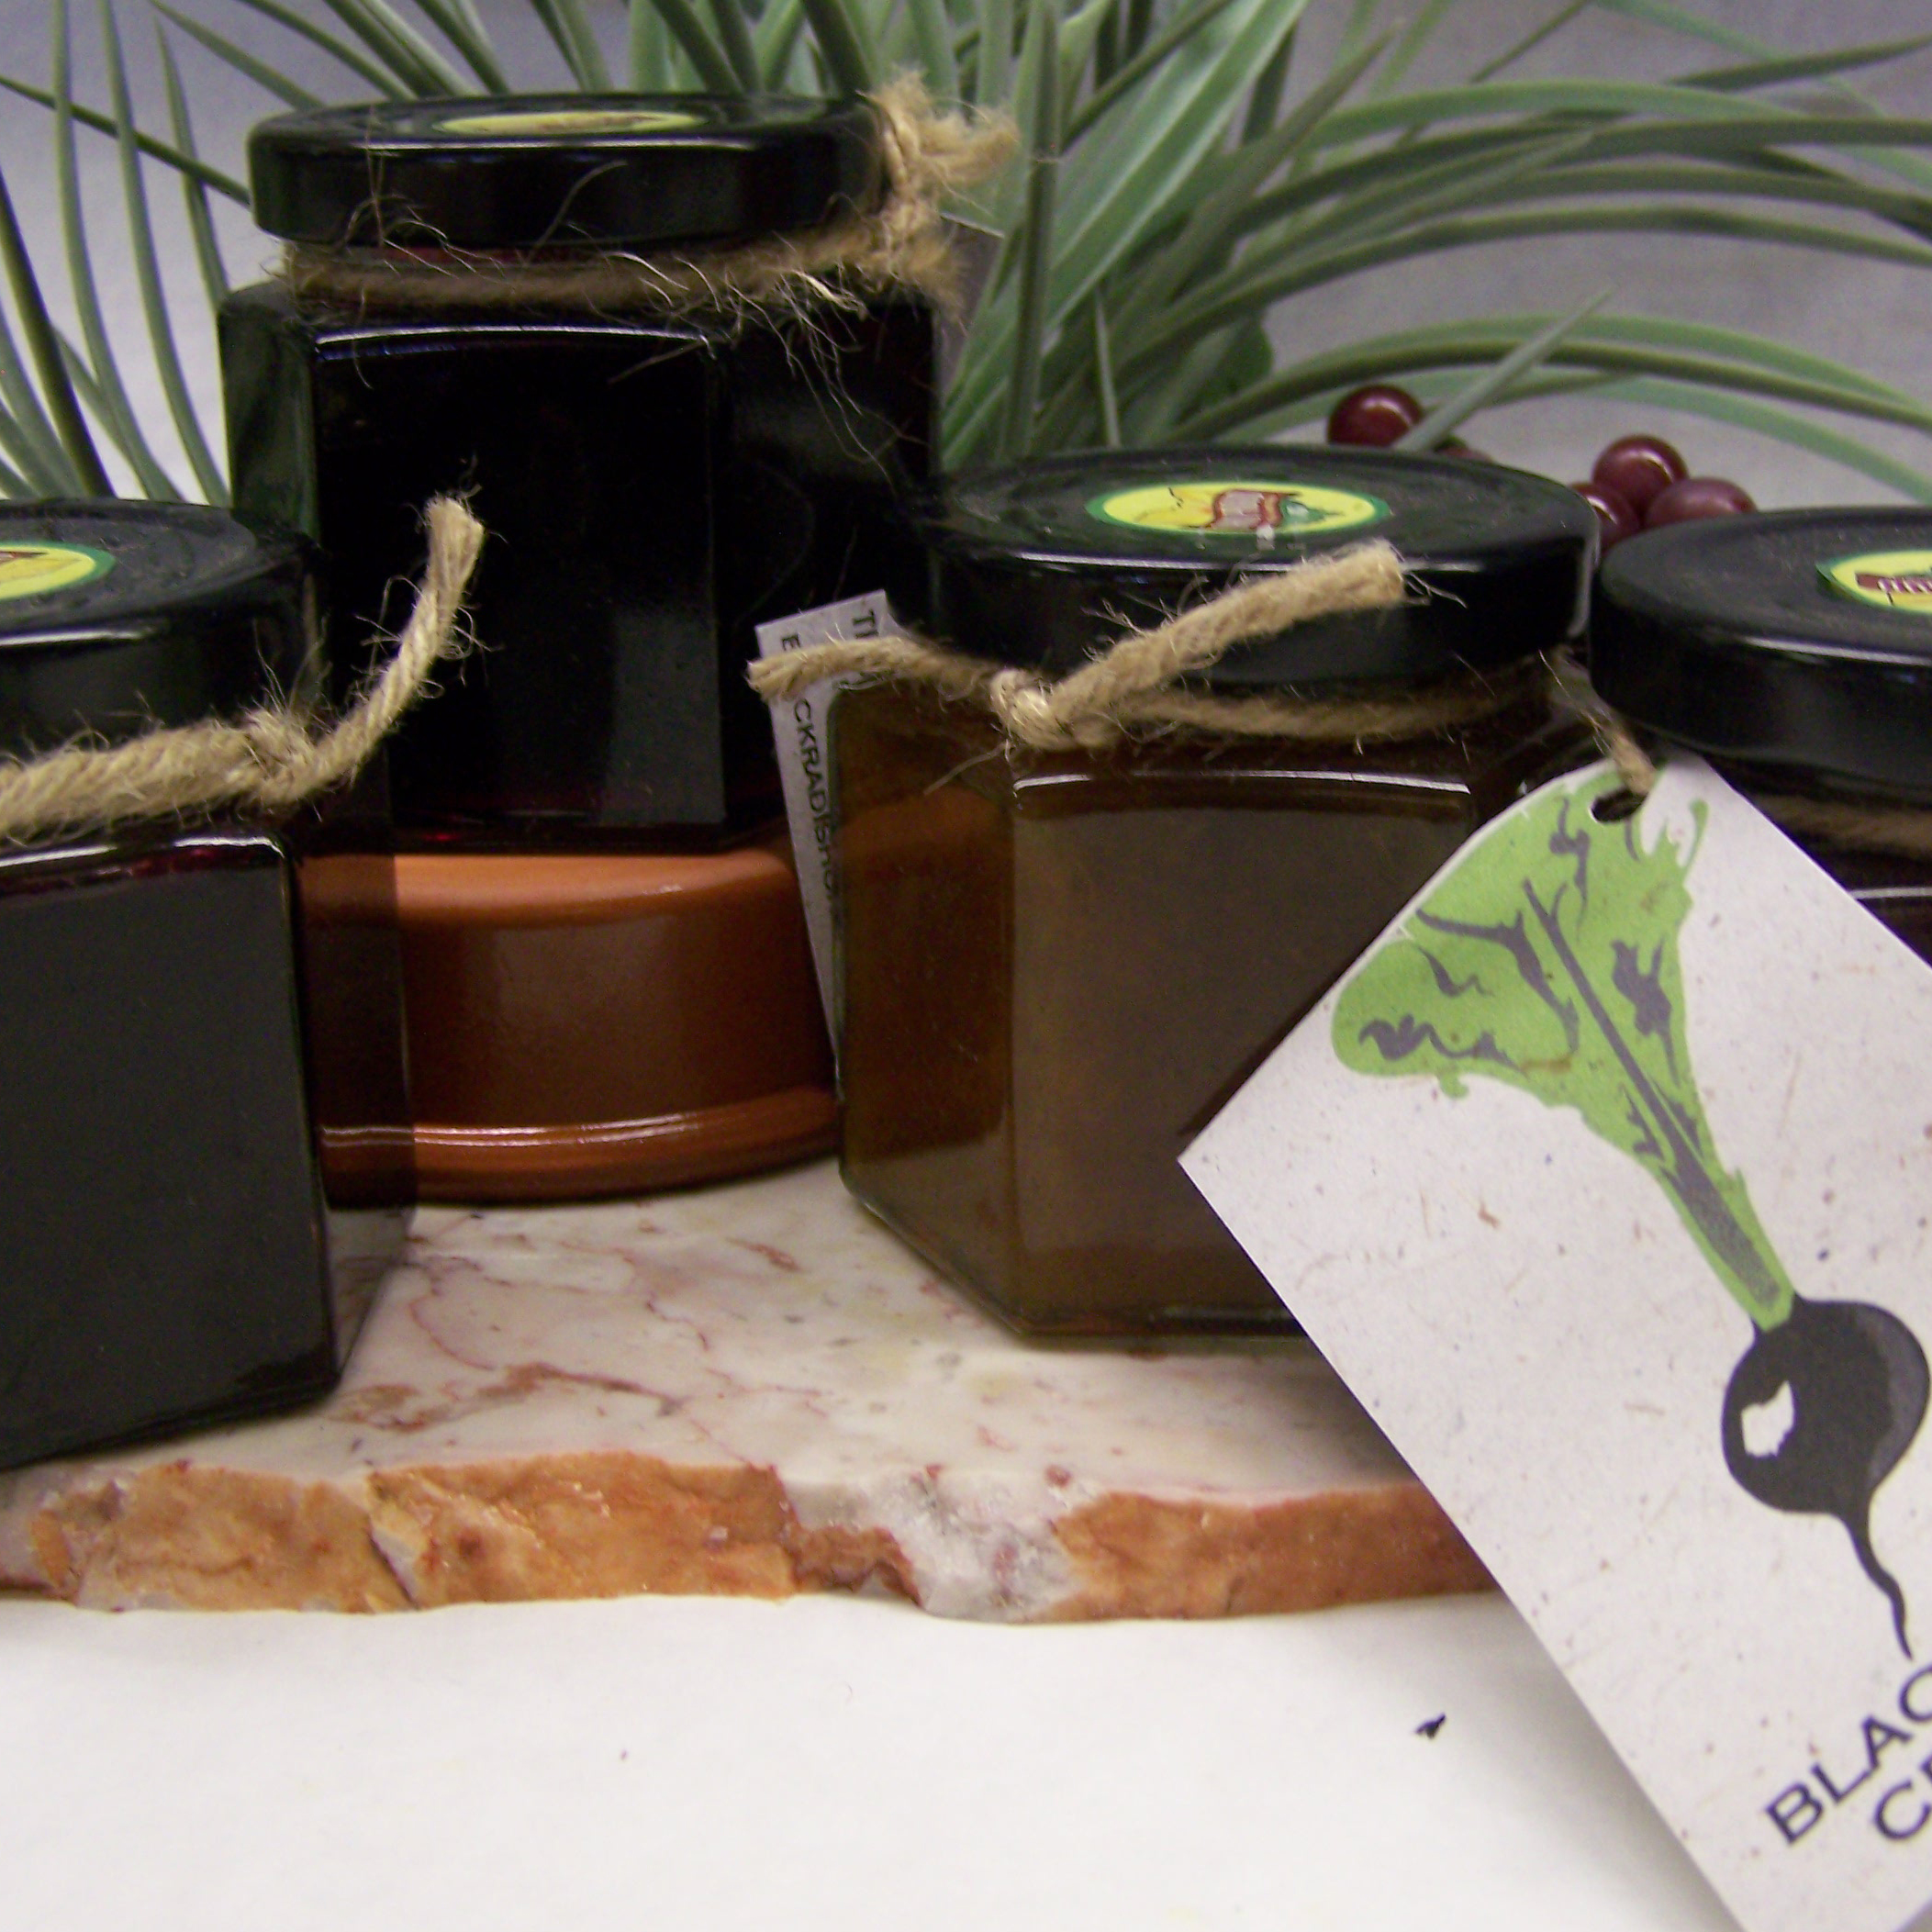 Black Radish Creamery Preserves - assorted 4 oz jar